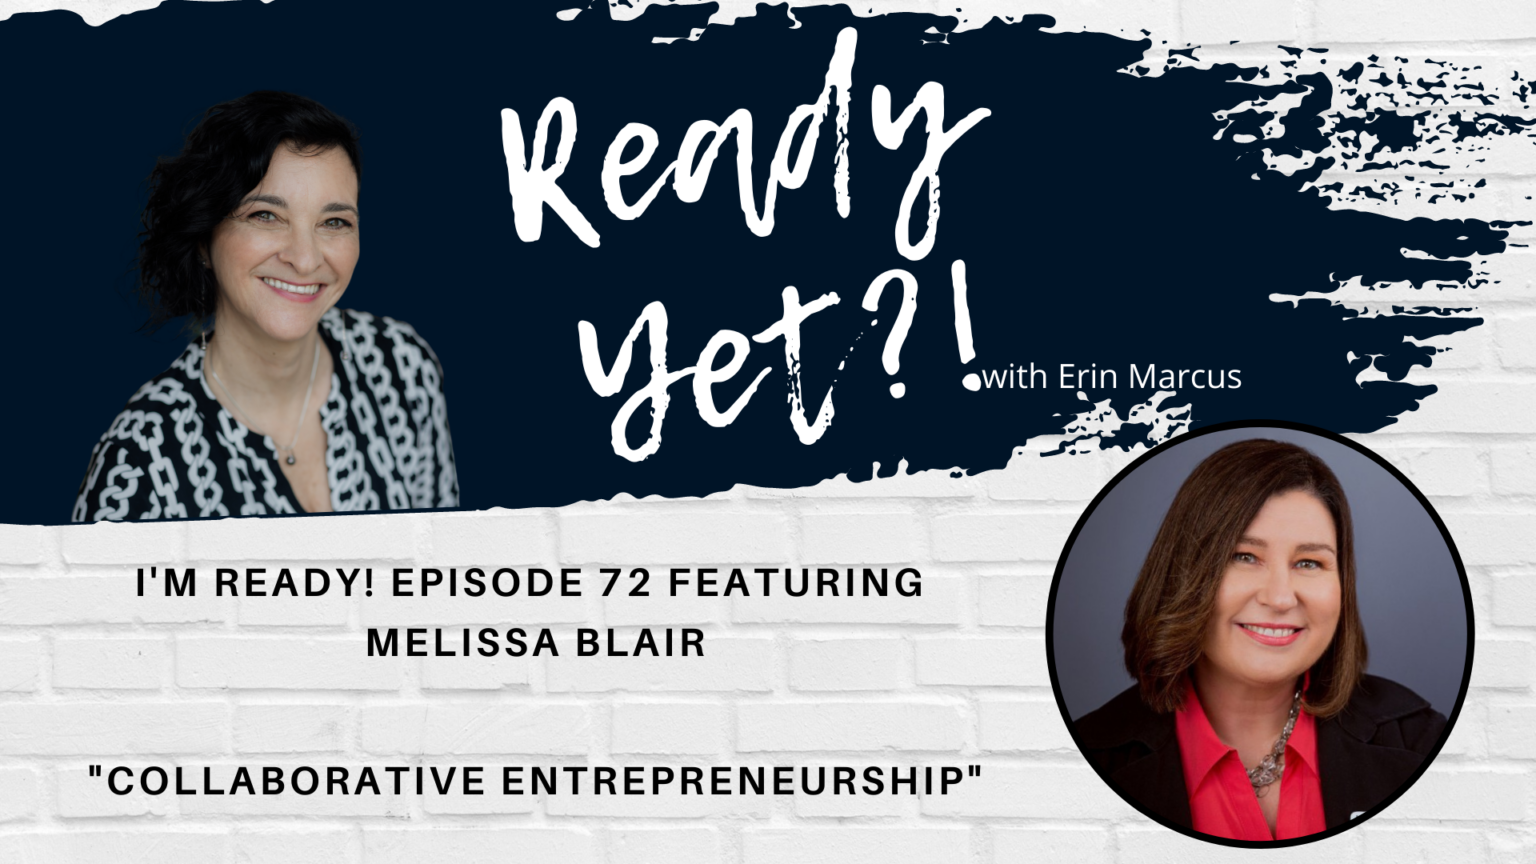 Episode 72 Interview with Melissa Blair: Collaborative Entrepreneurship